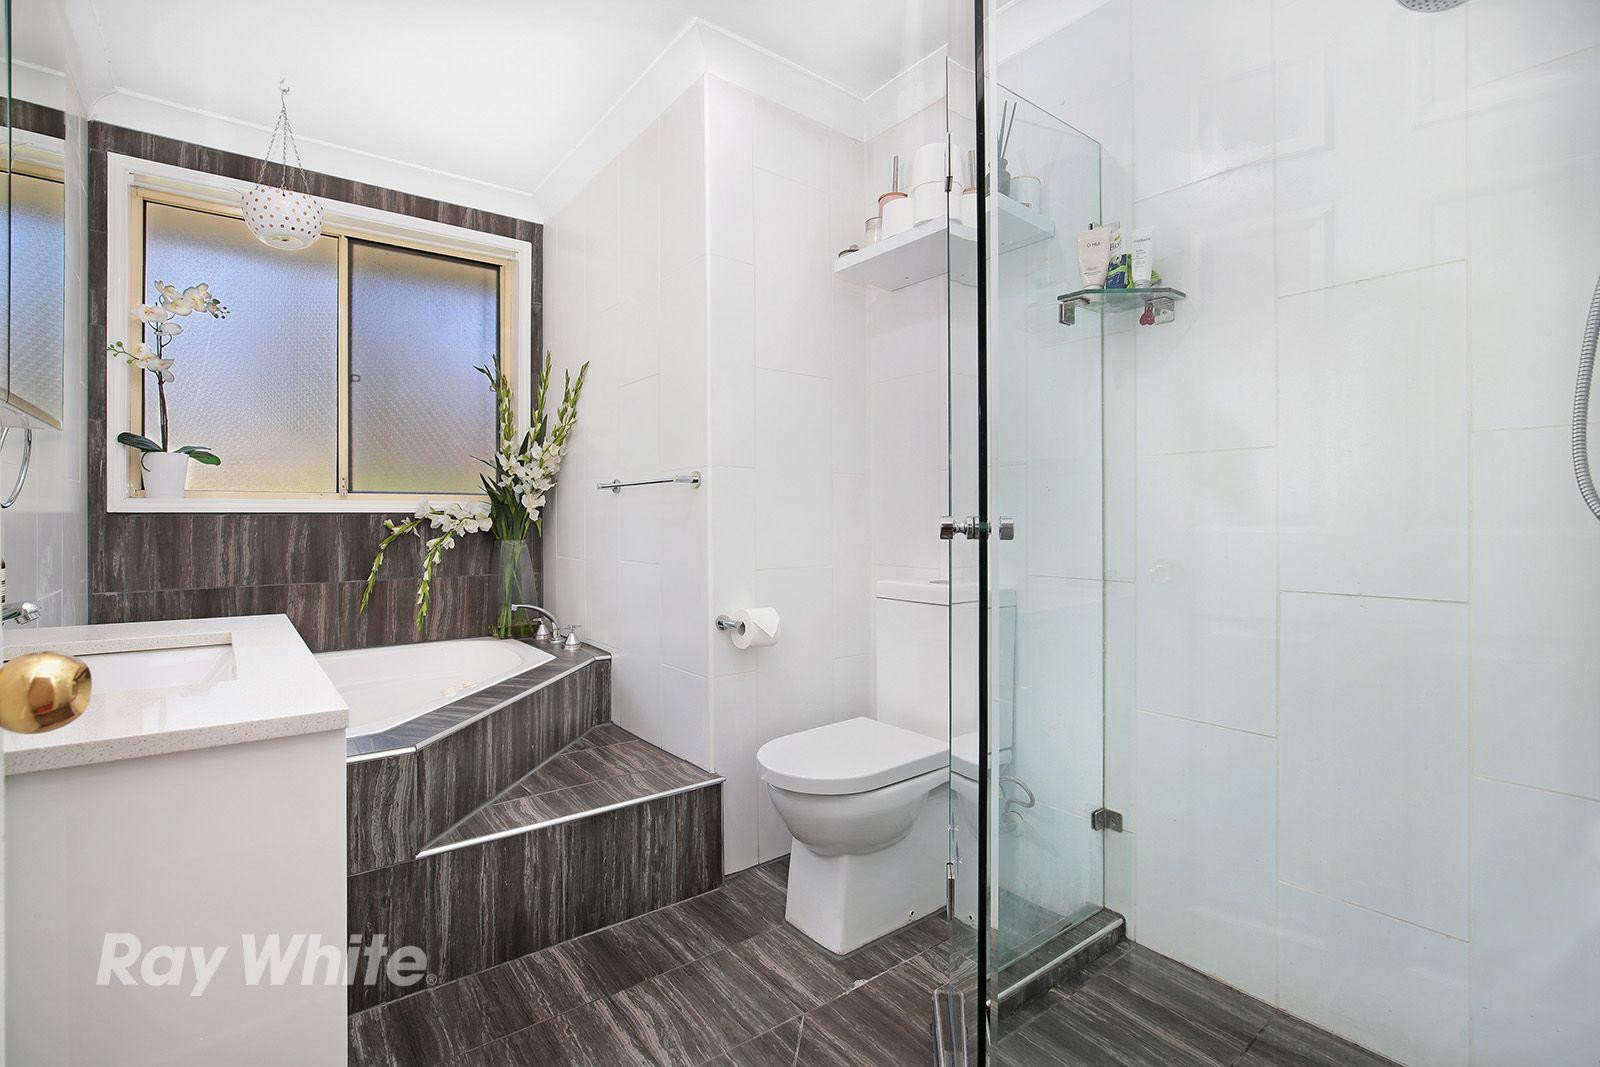 37A Valerie Avenue, Baulkham Hills NSW 2153, Image 1